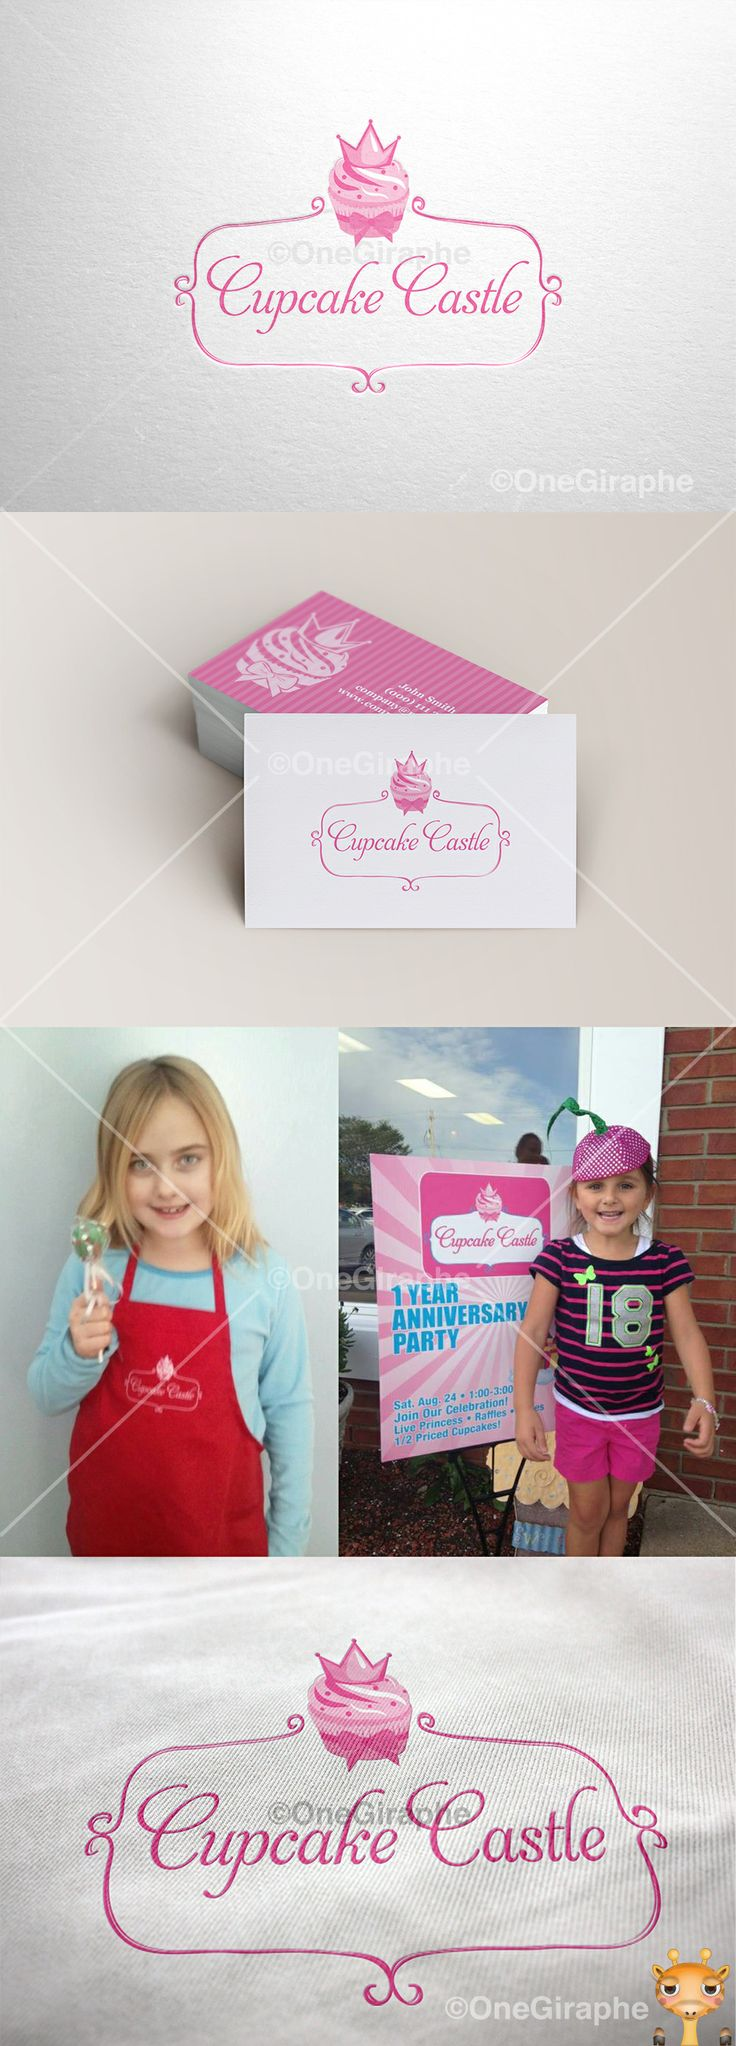 #cupcake #cake #bake #bakery #logo #portfolio #design #graphic #graphicdesign #designer #cute #cake #stand #cupcake #pink #behance #logopond #brandstack #bestdesigner #brand #identity #brandidentity #princess #castle #sweet #cute